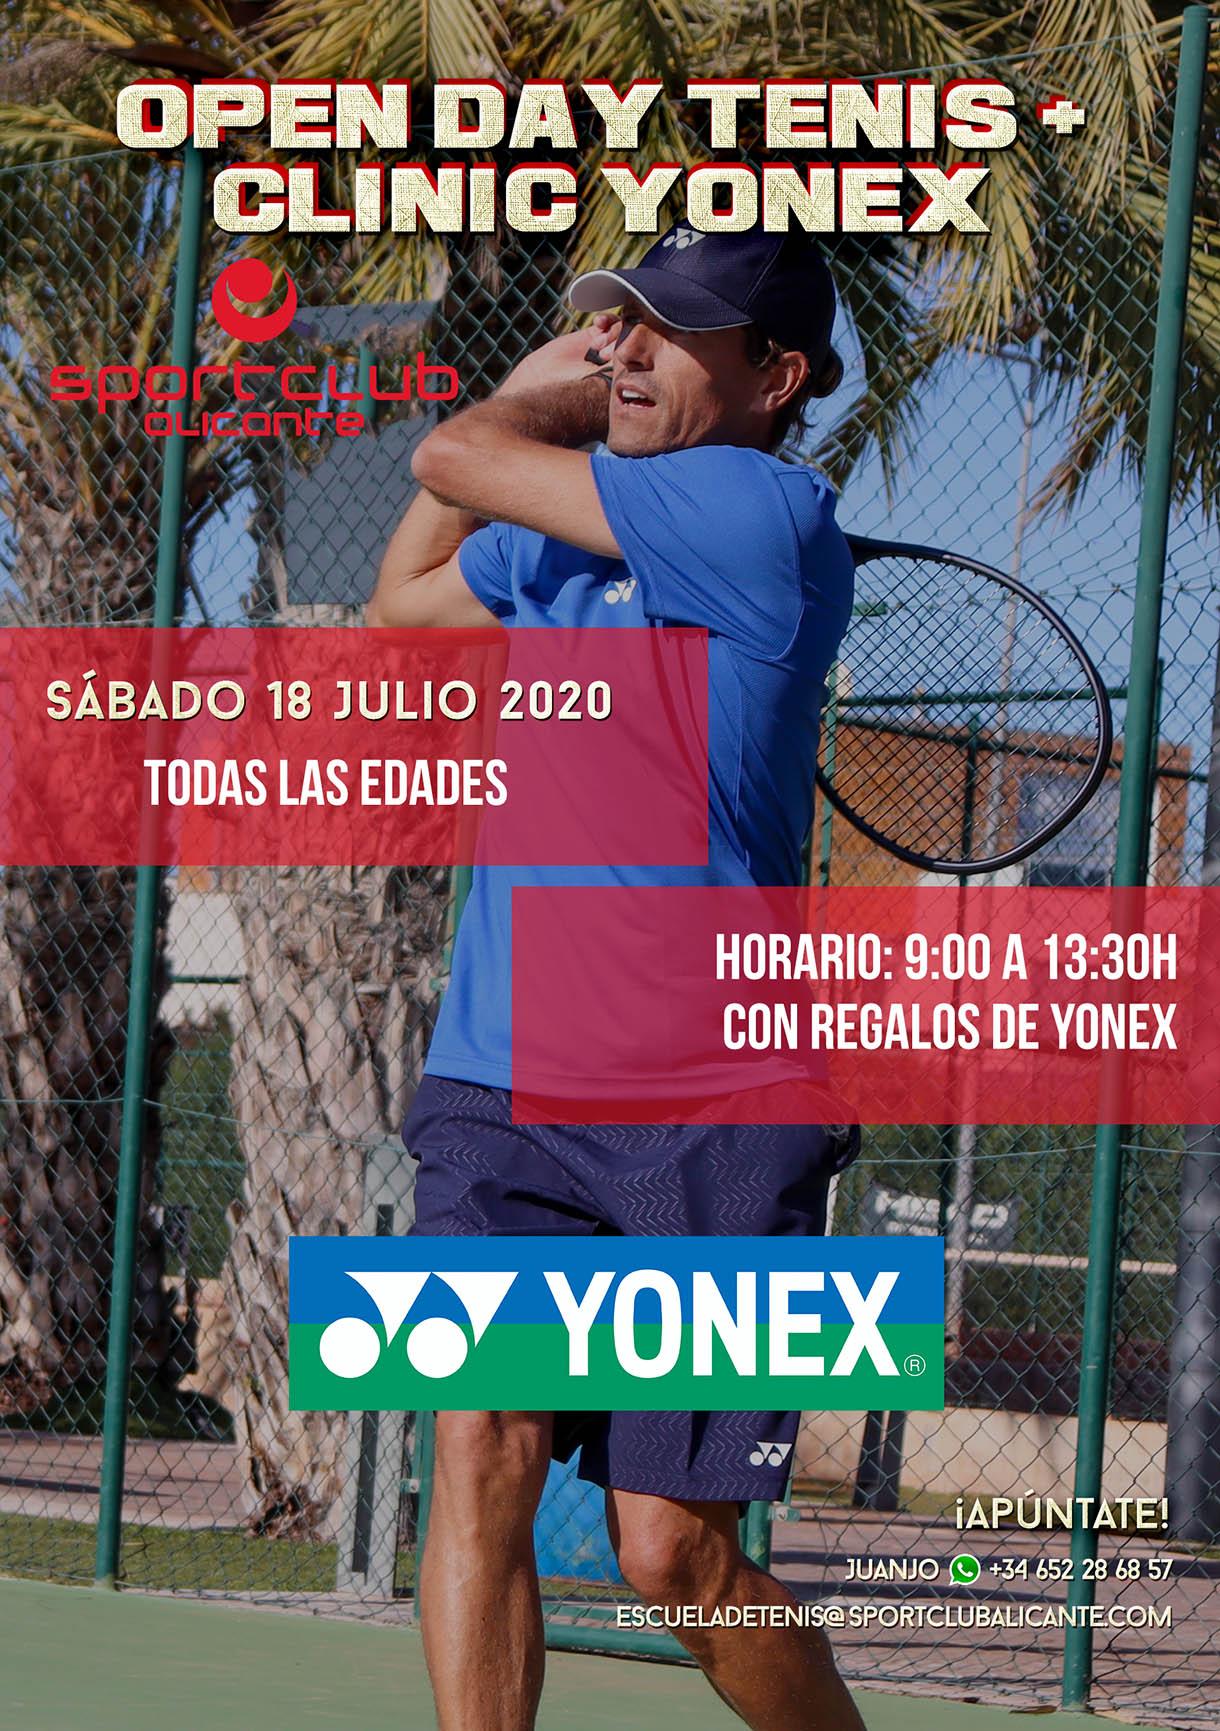 openday-clinic-yonex